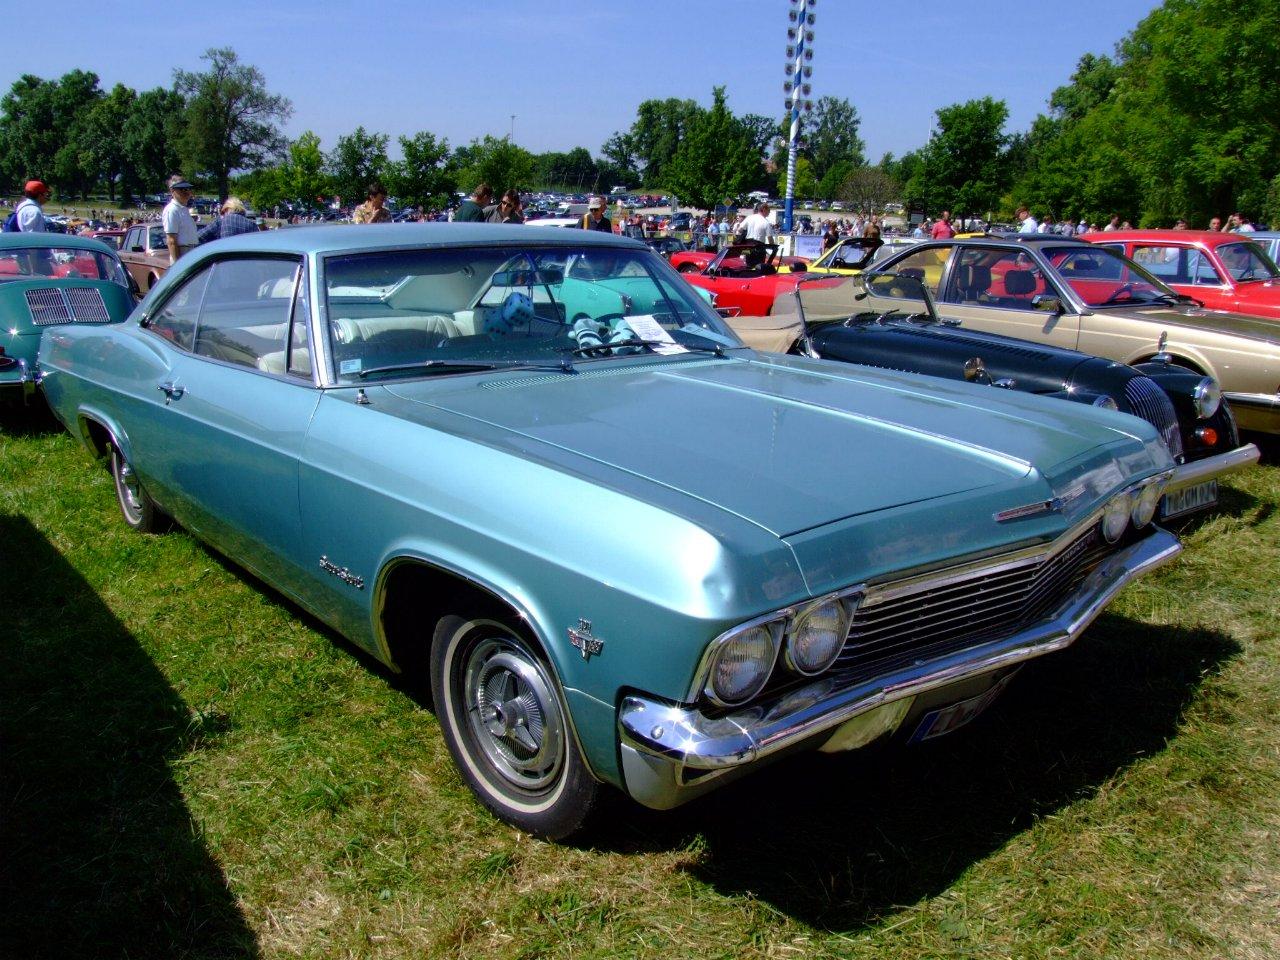 File:Chevrolet Impala SS 1965 1.JPG - Wikimedia Commons